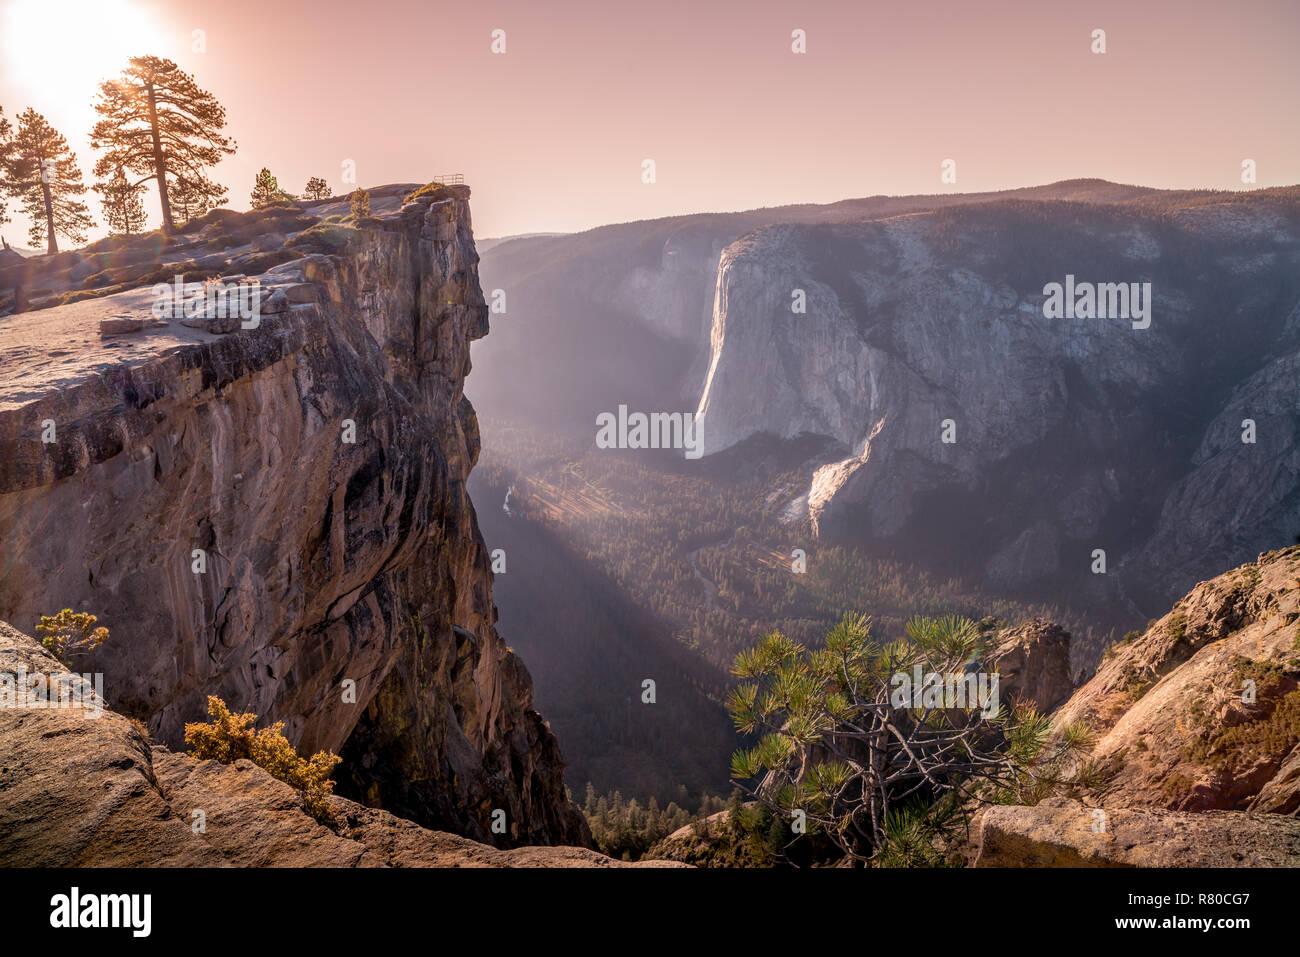 Yosemite National Park, y compris les demi-dôme, Yosemite Falls, et El Capitan dans la Merced River dans la vallée Yosemite Banque D'Images